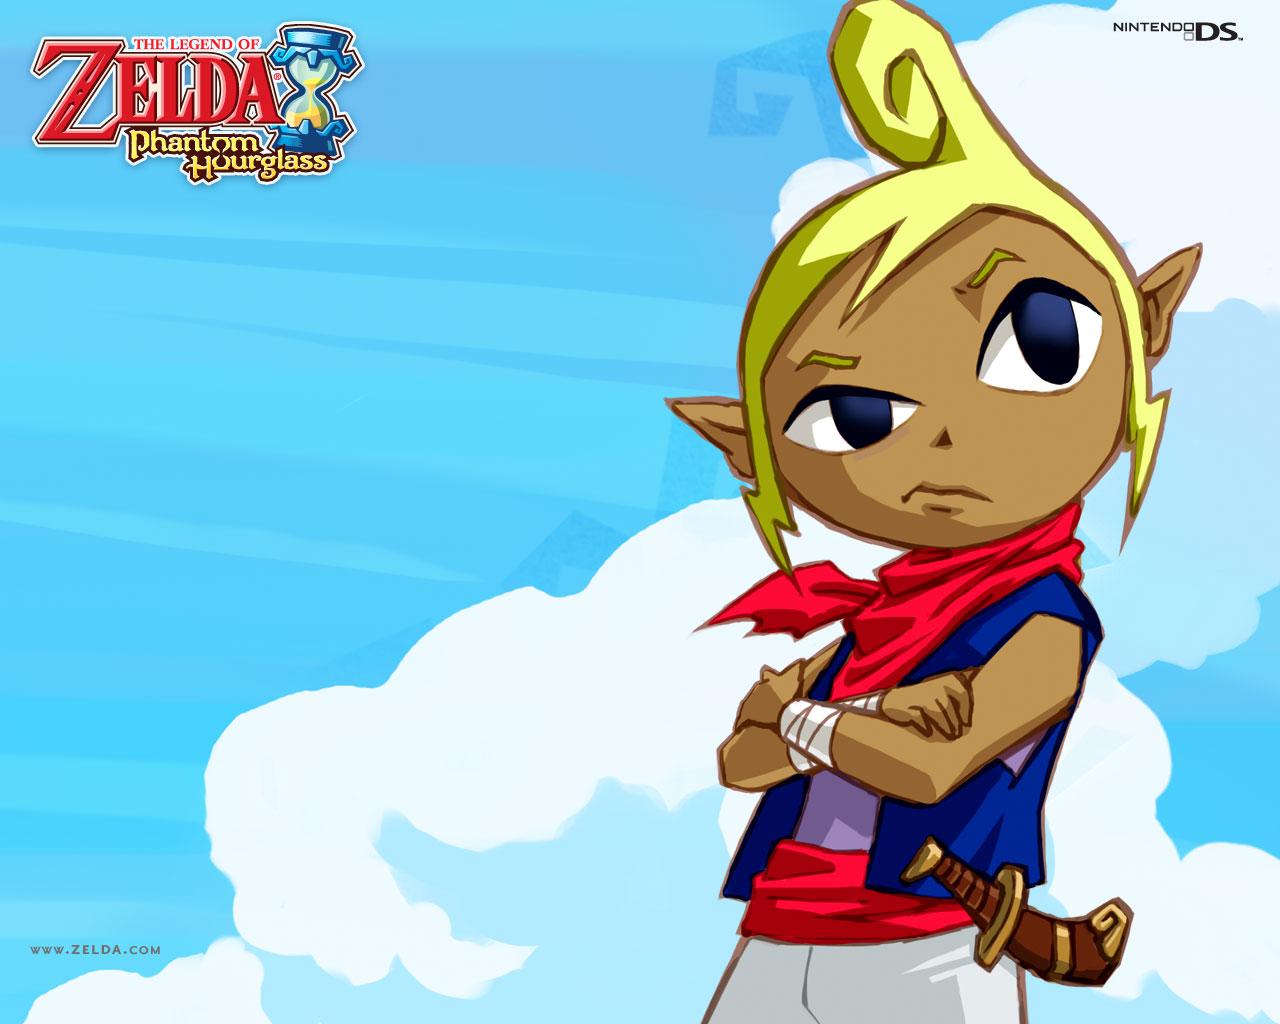 NDS Cheats - The Legend of Zelda: Phantom Hourglass Wiki Guide - IGN